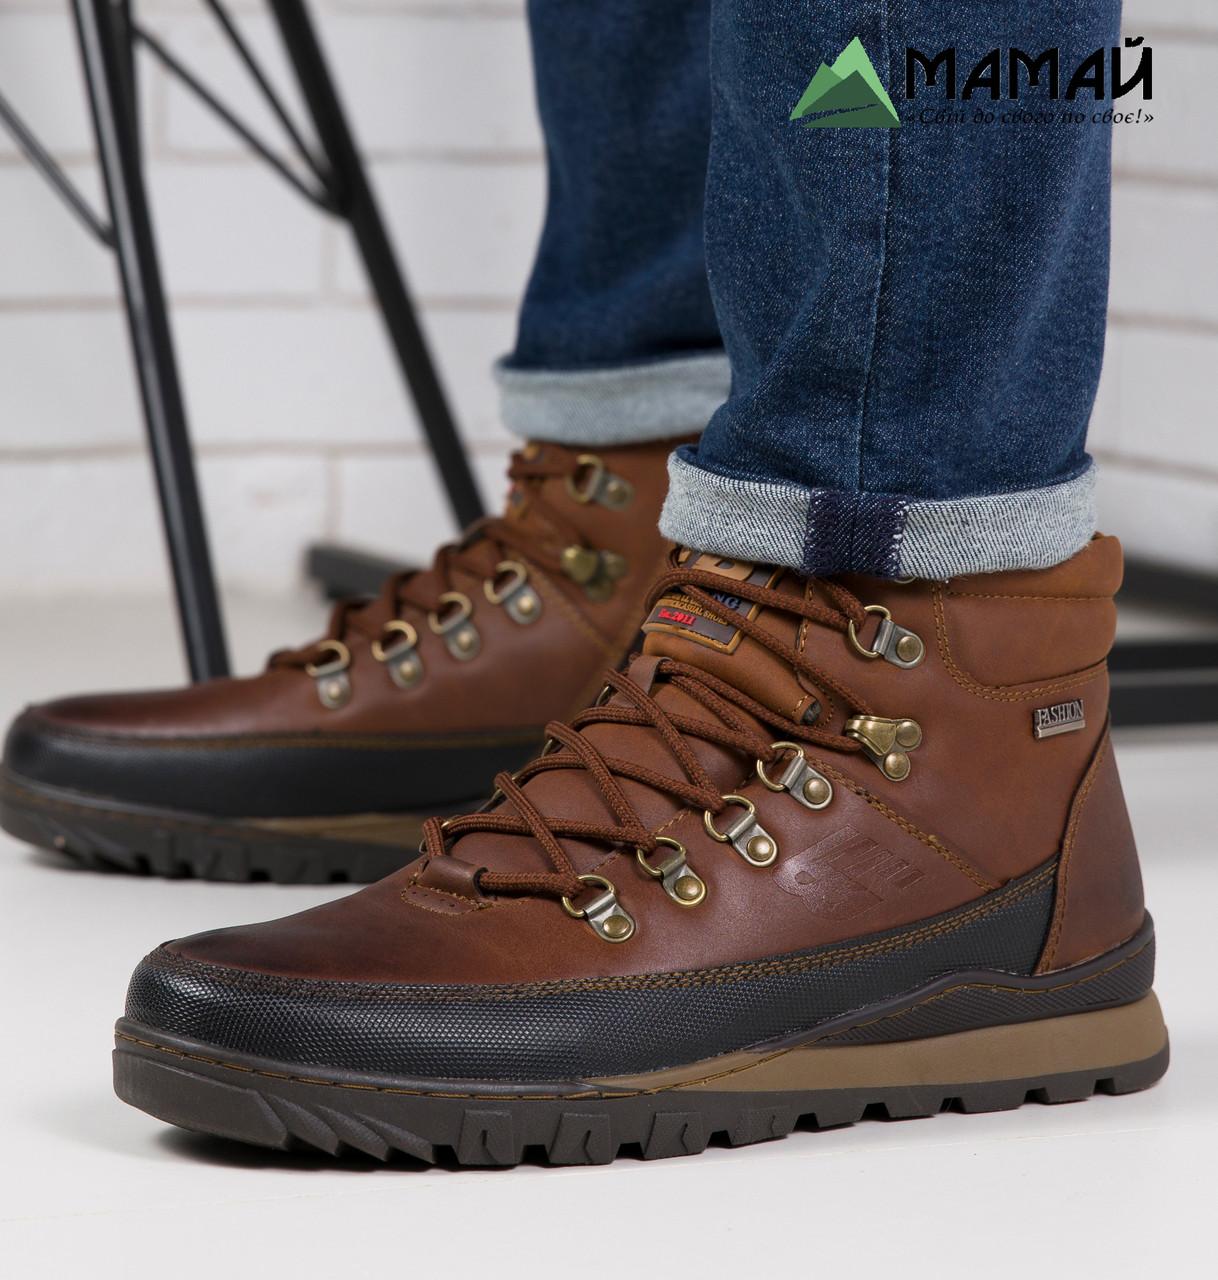 Ботинки мужские зимние -20 °C 40,44р